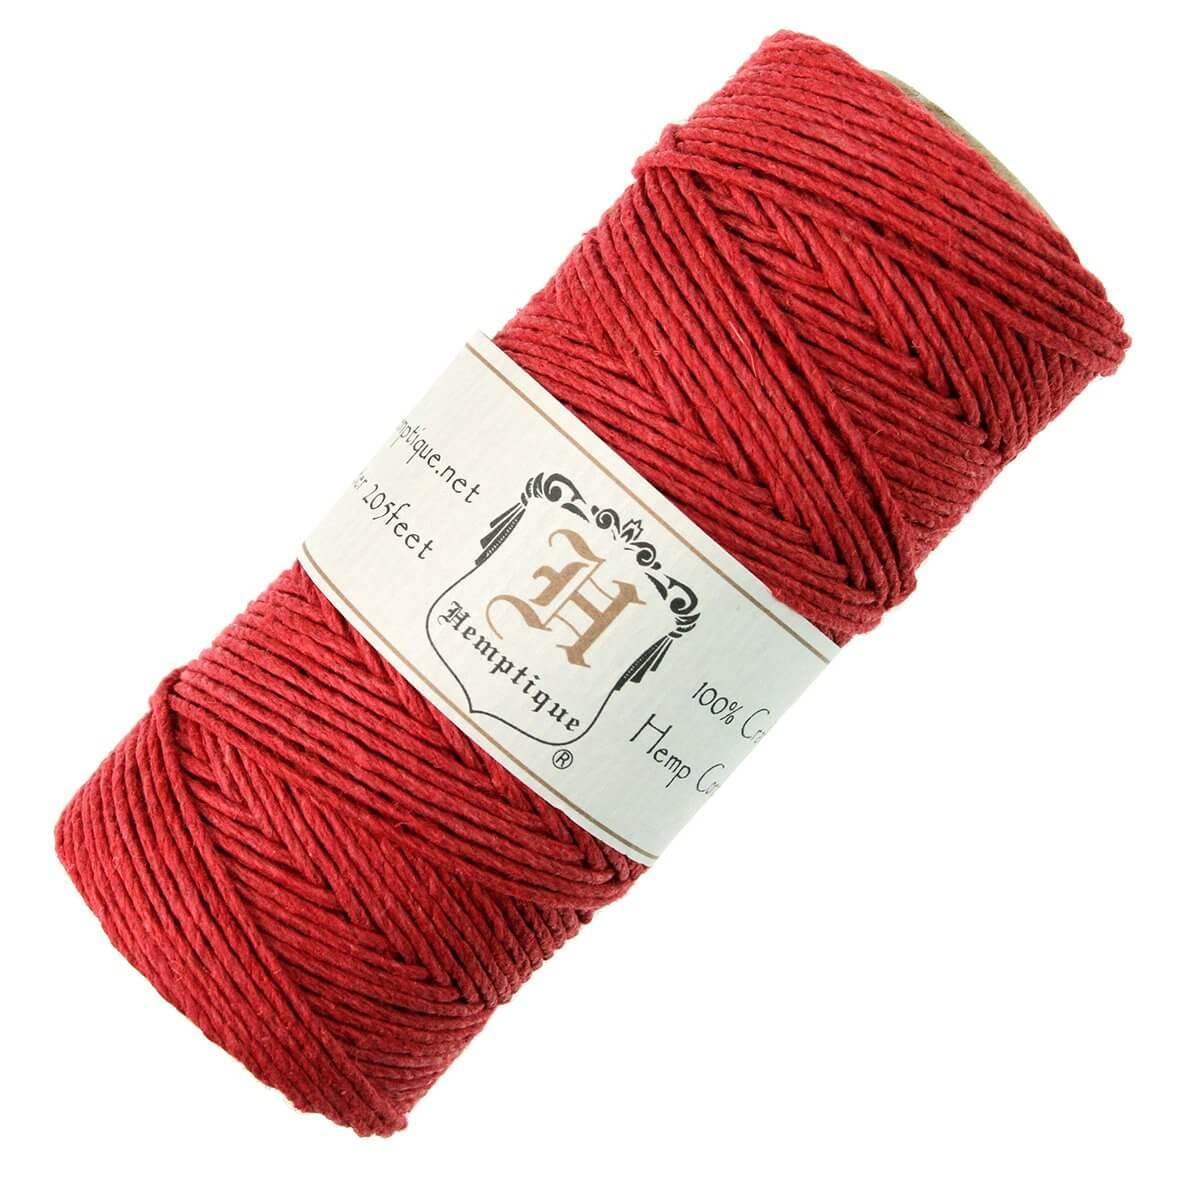 Hemptique Hemp Cord Red